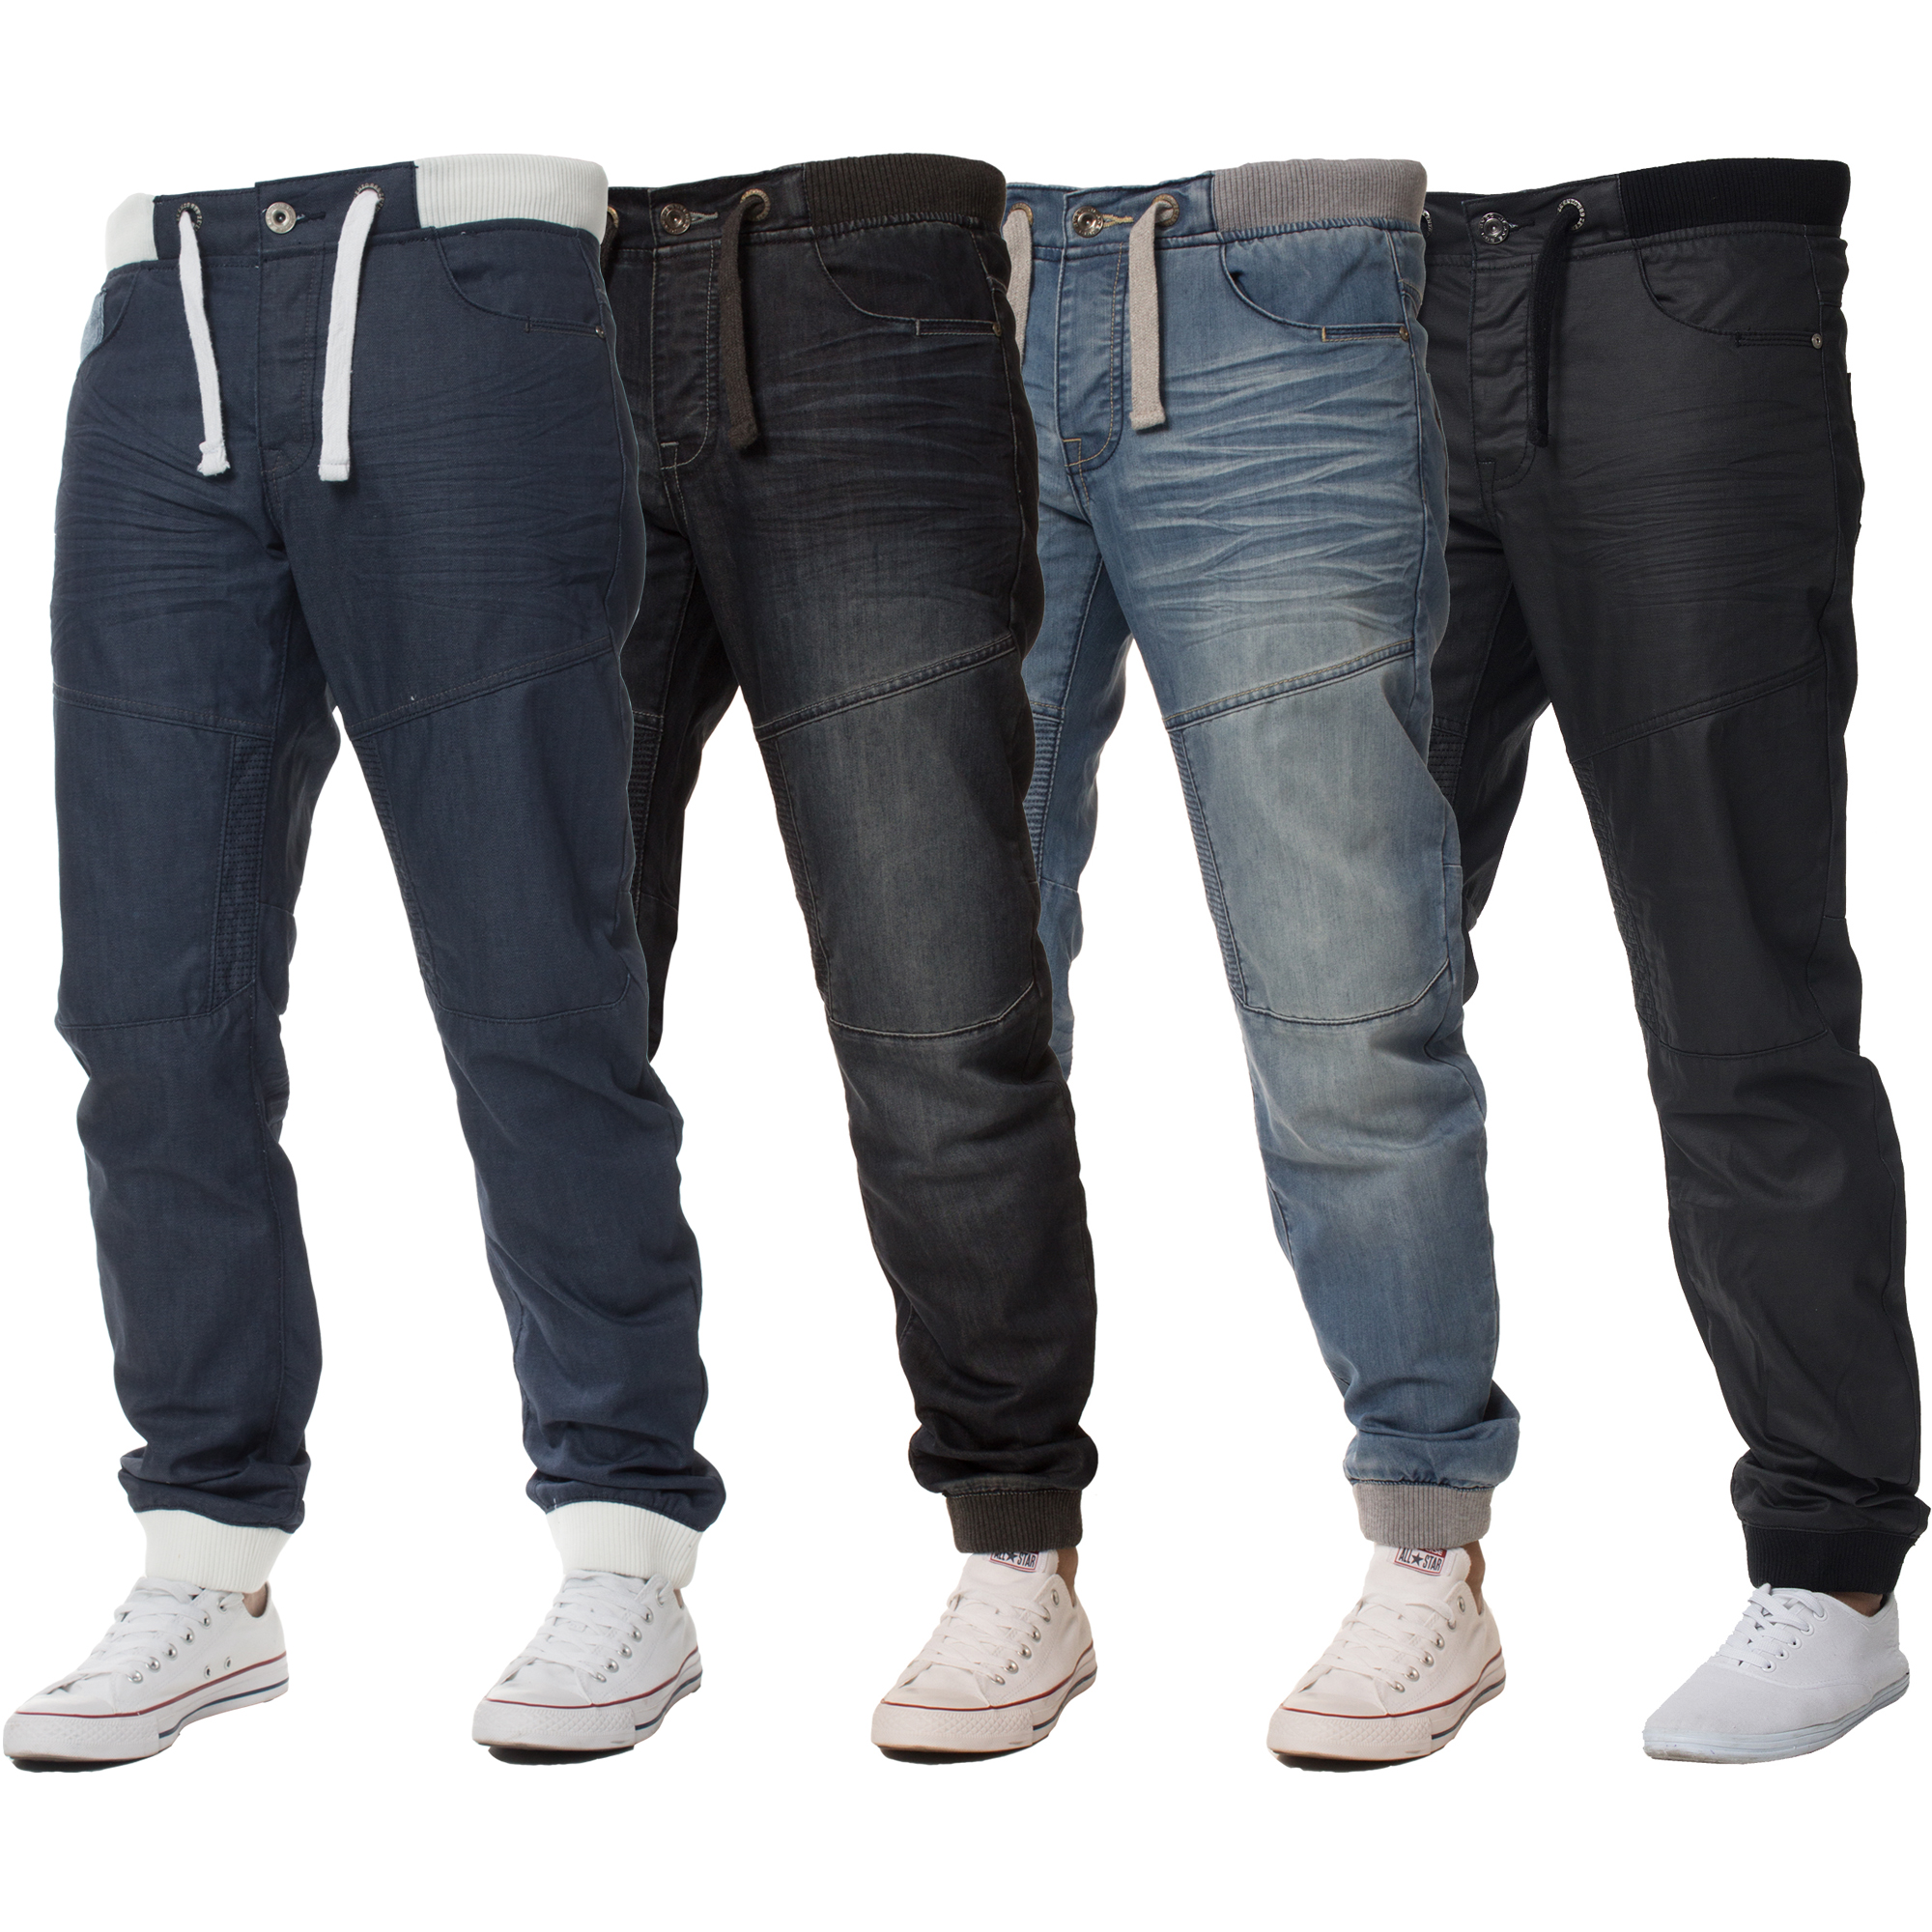 new mens enzo cuffed denim joggers jeans black fashion all big king sizes ebay. Black Bedroom Furniture Sets. Home Design Ideas